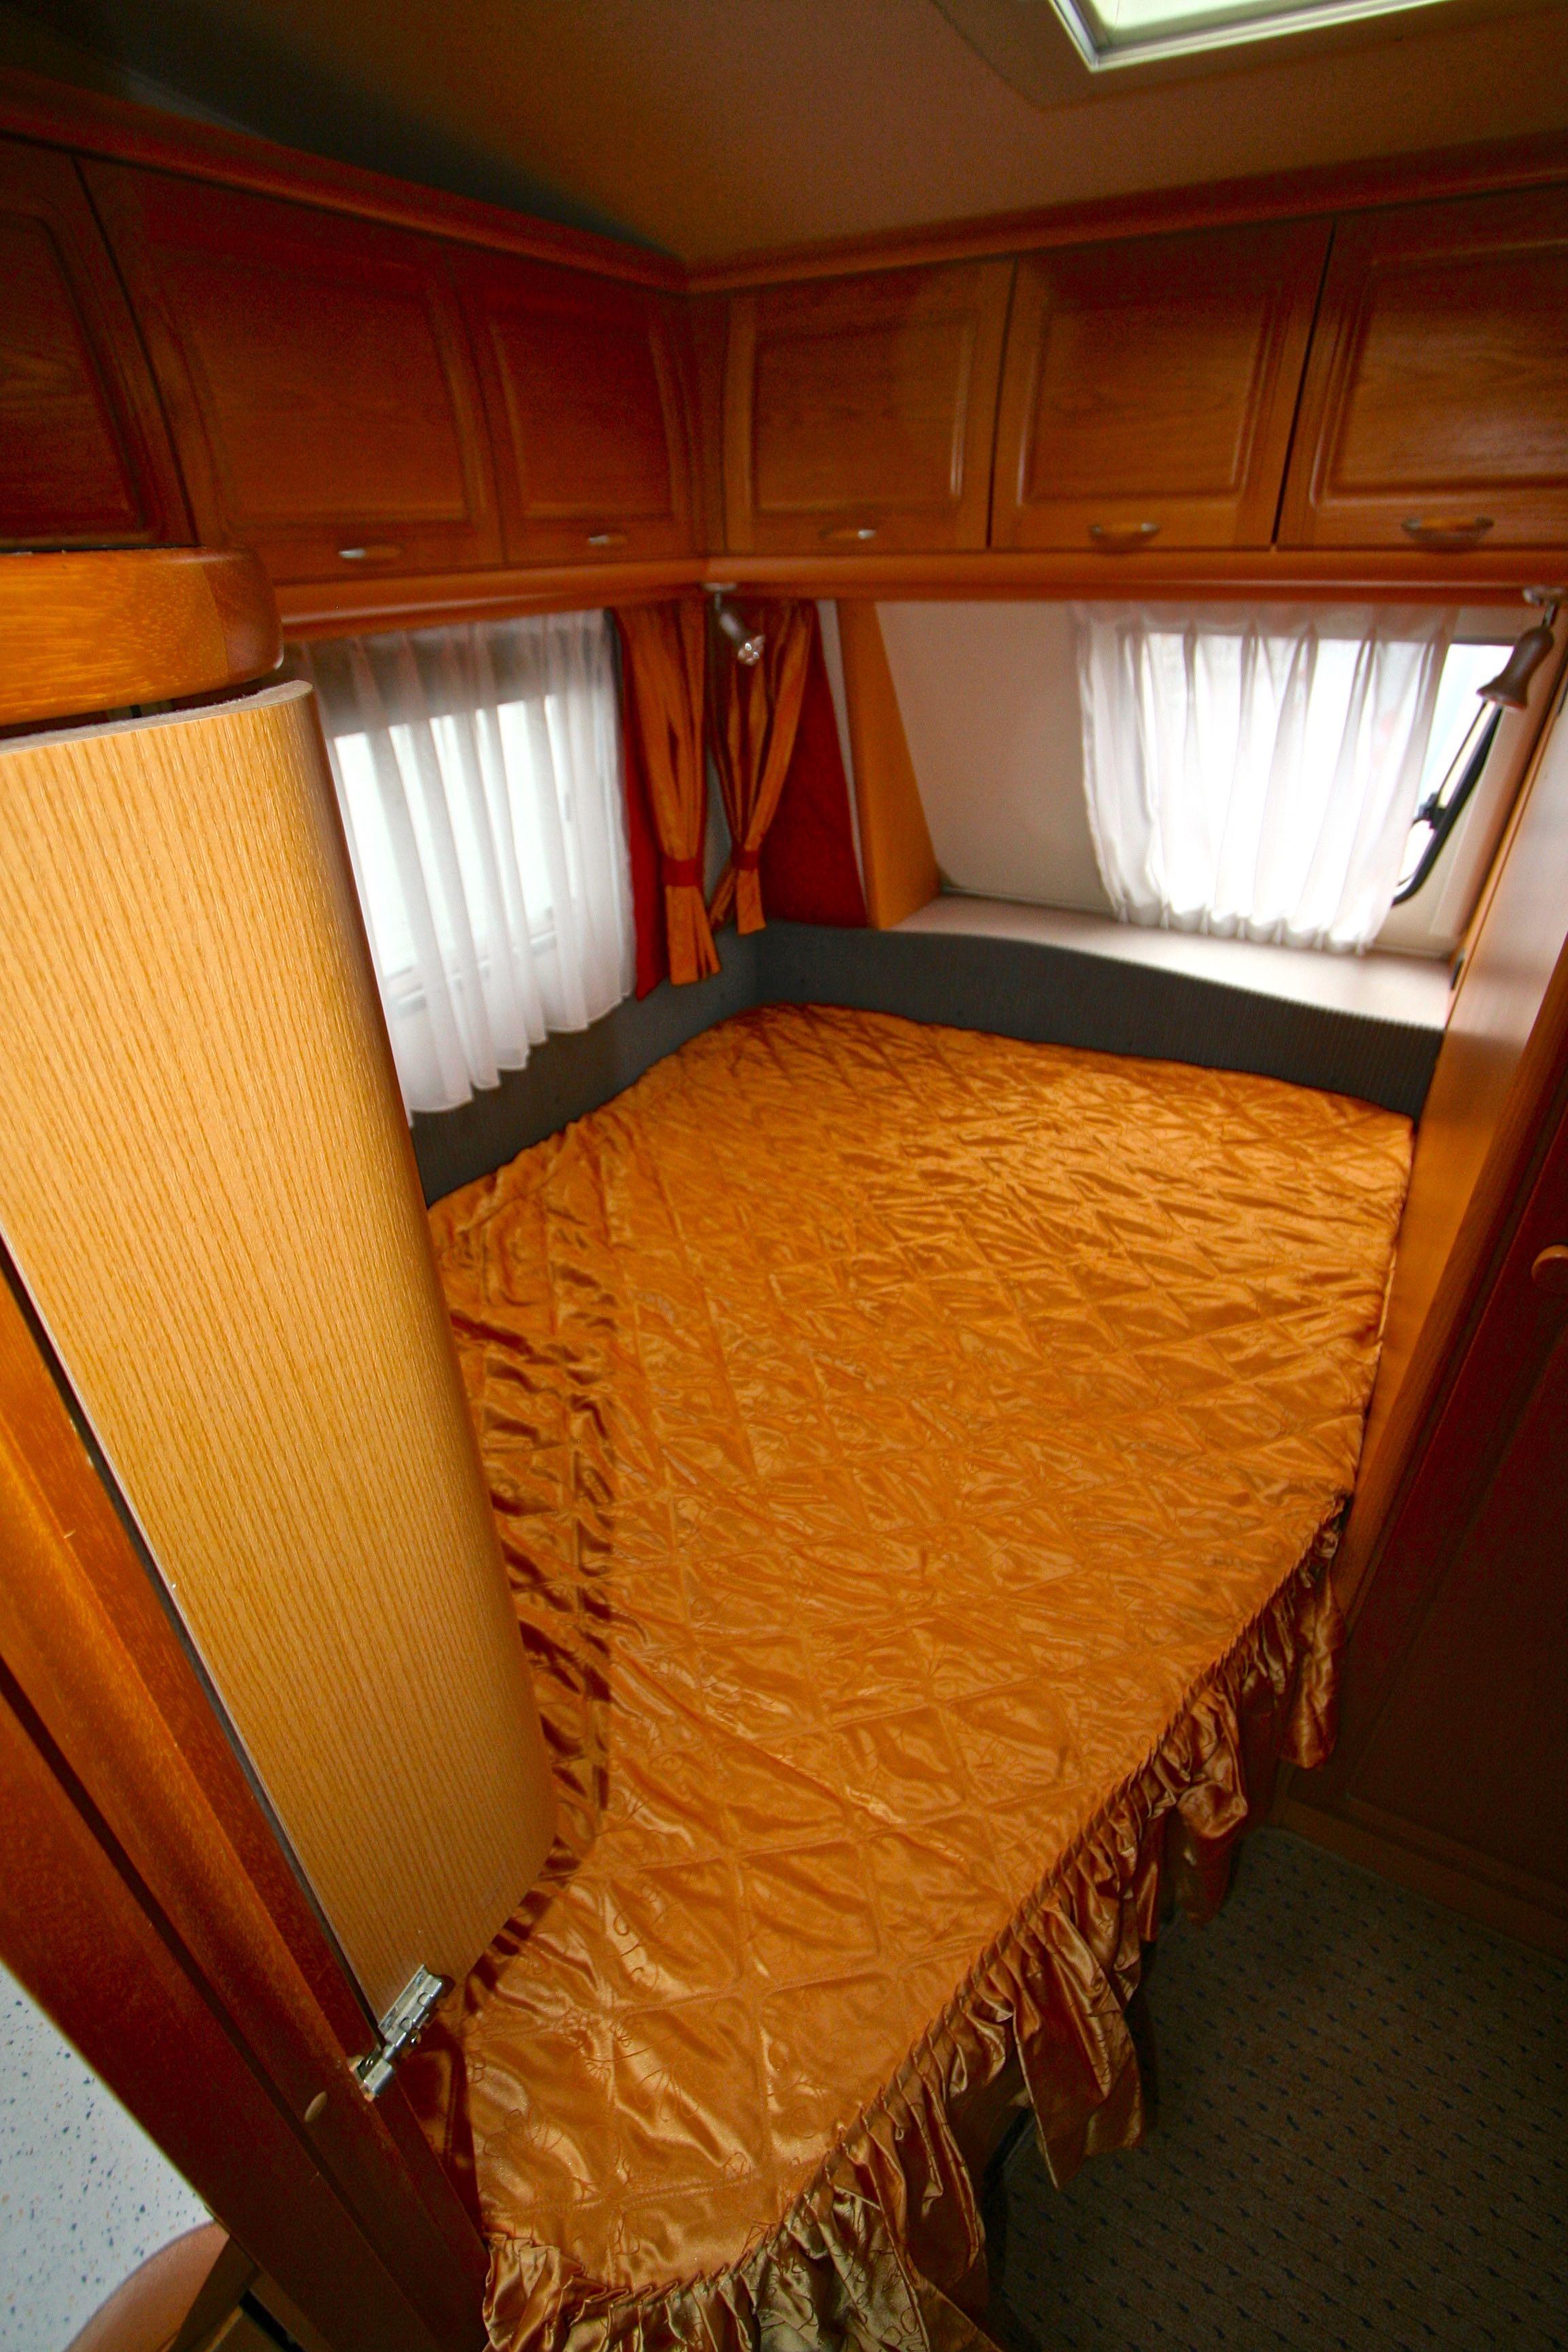 hobby 495 ufe prestige occasion de 2006 caravane en vente roques sur garonne haute garonne. Black Bedroom Furniture Sets. Home Design Ideas